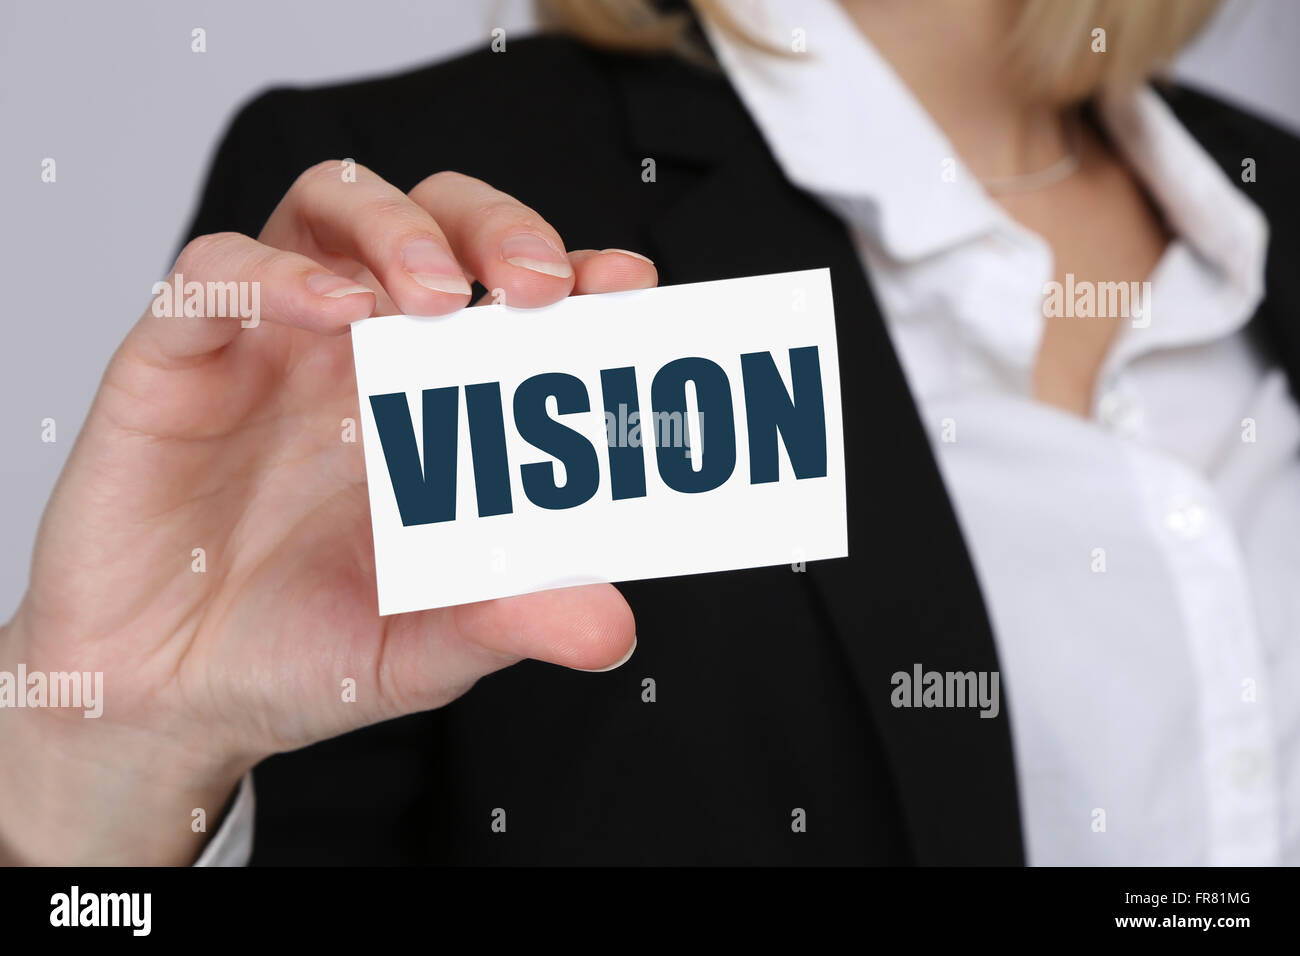 Vision Future Stockfotos & Vision Future Bilder - Alamy